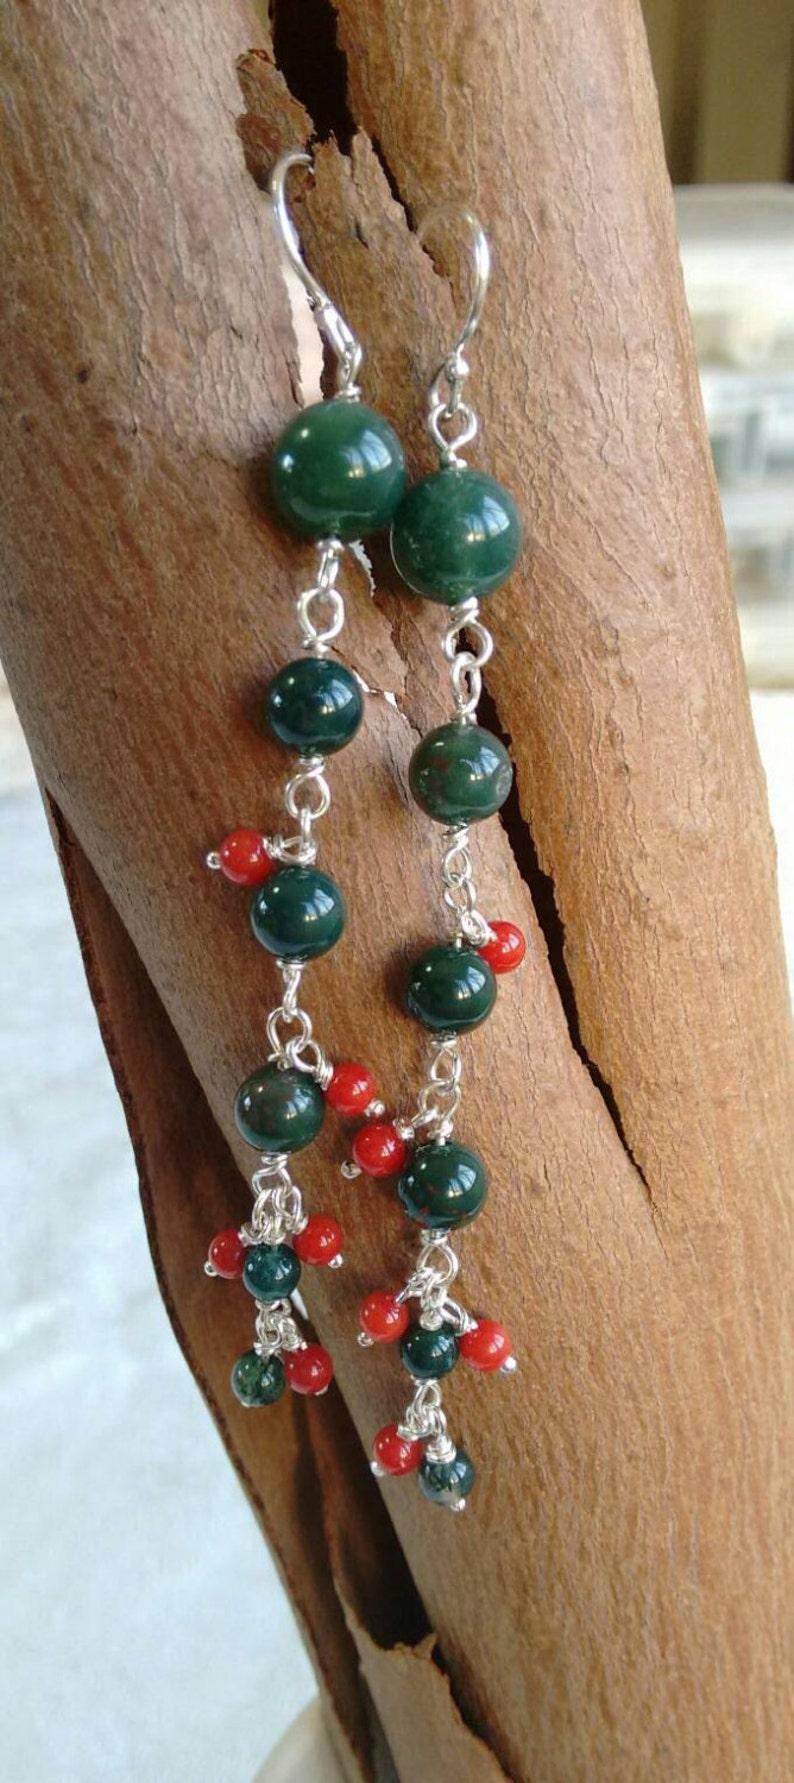 Green Moss Agate Earrings Red Coral Sterling Silver Fun Earrings.